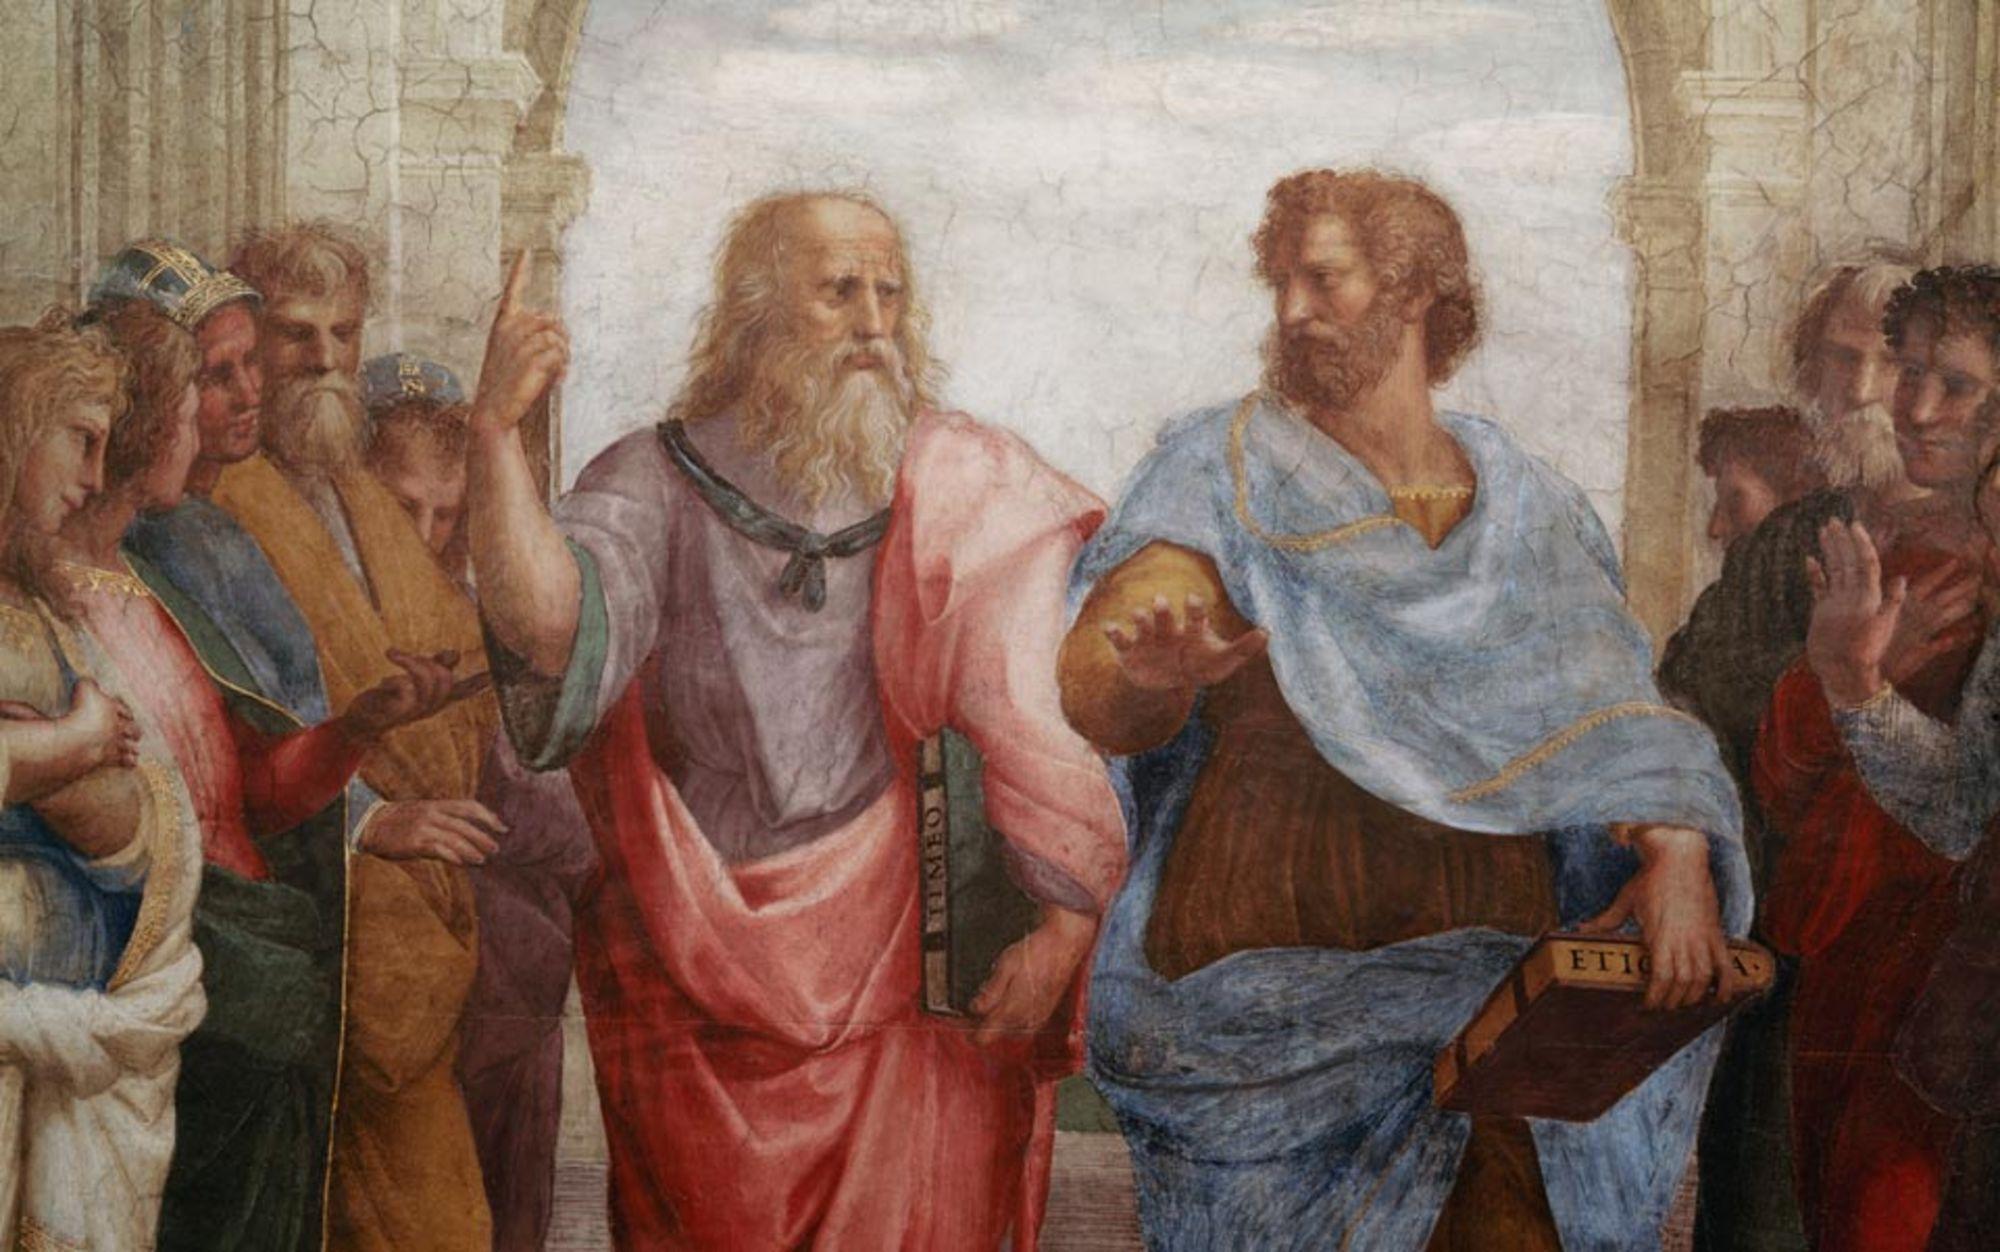 plato and aristotle philosophy essays